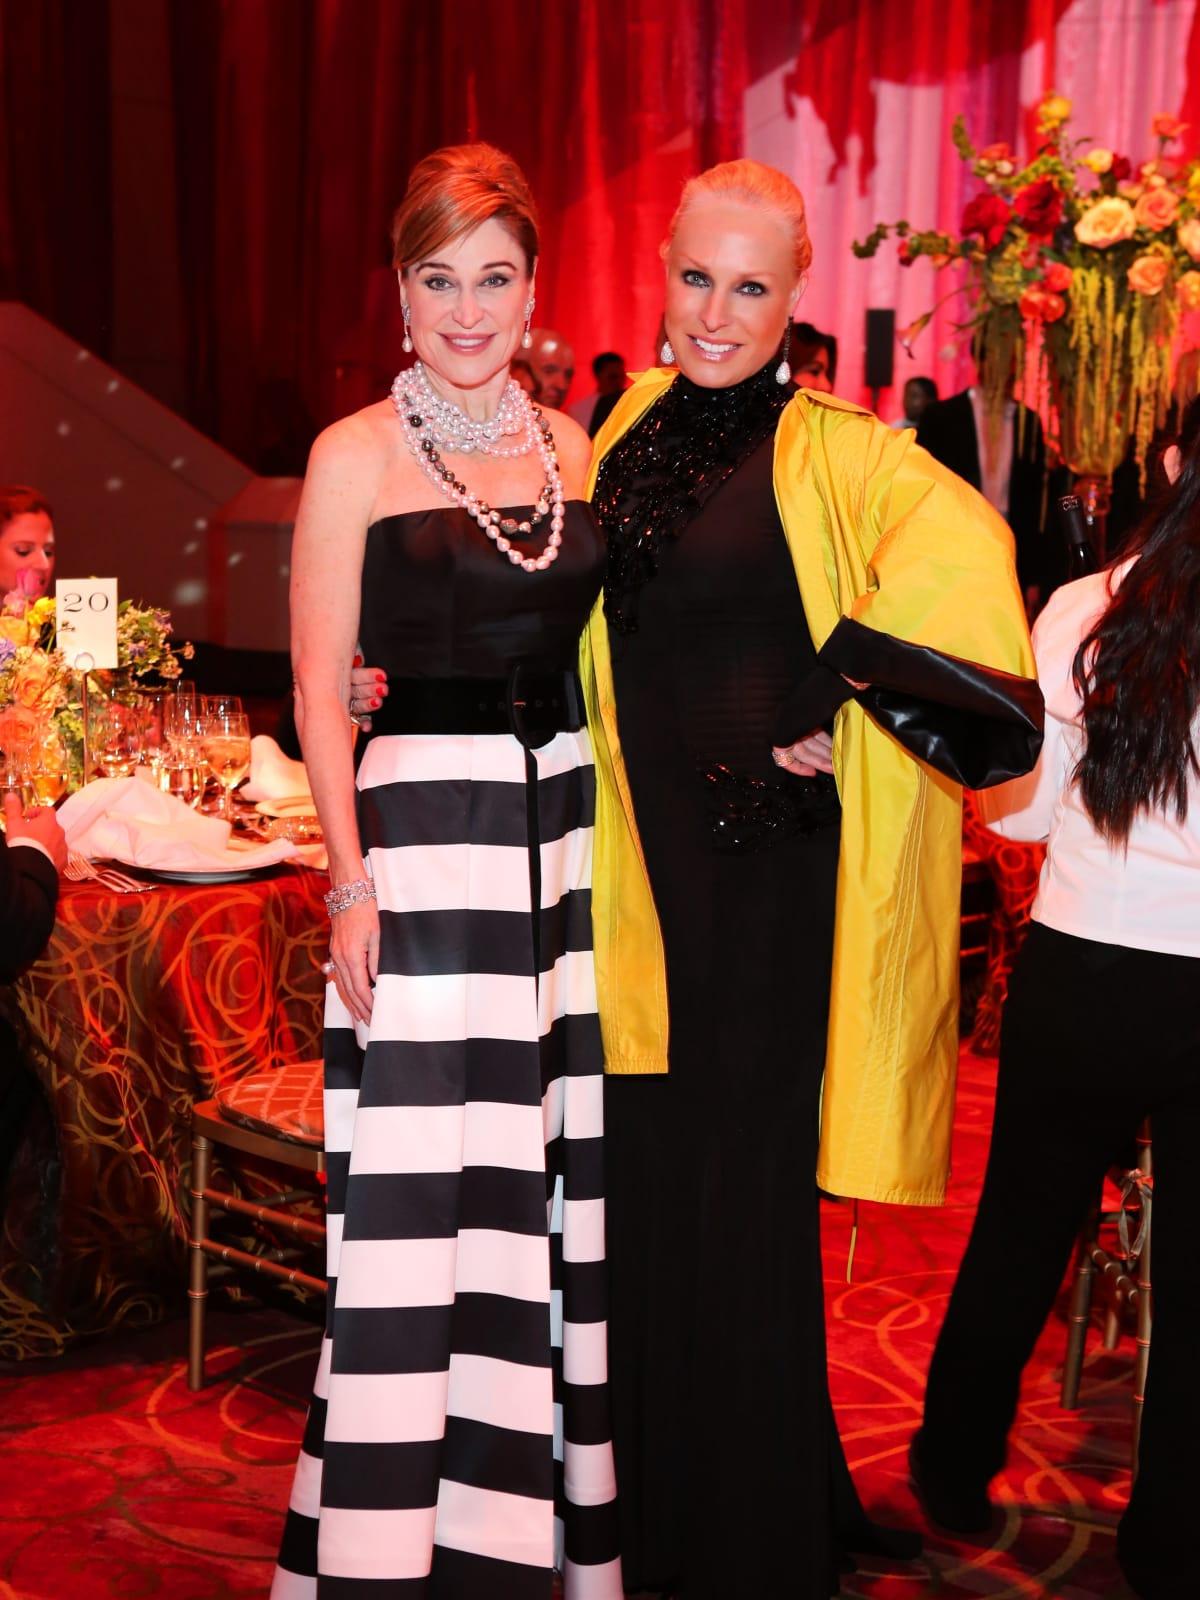 Houston Grand Opera Ball, 4/16, Becca Cason Thrash, Suzanne Saperstein